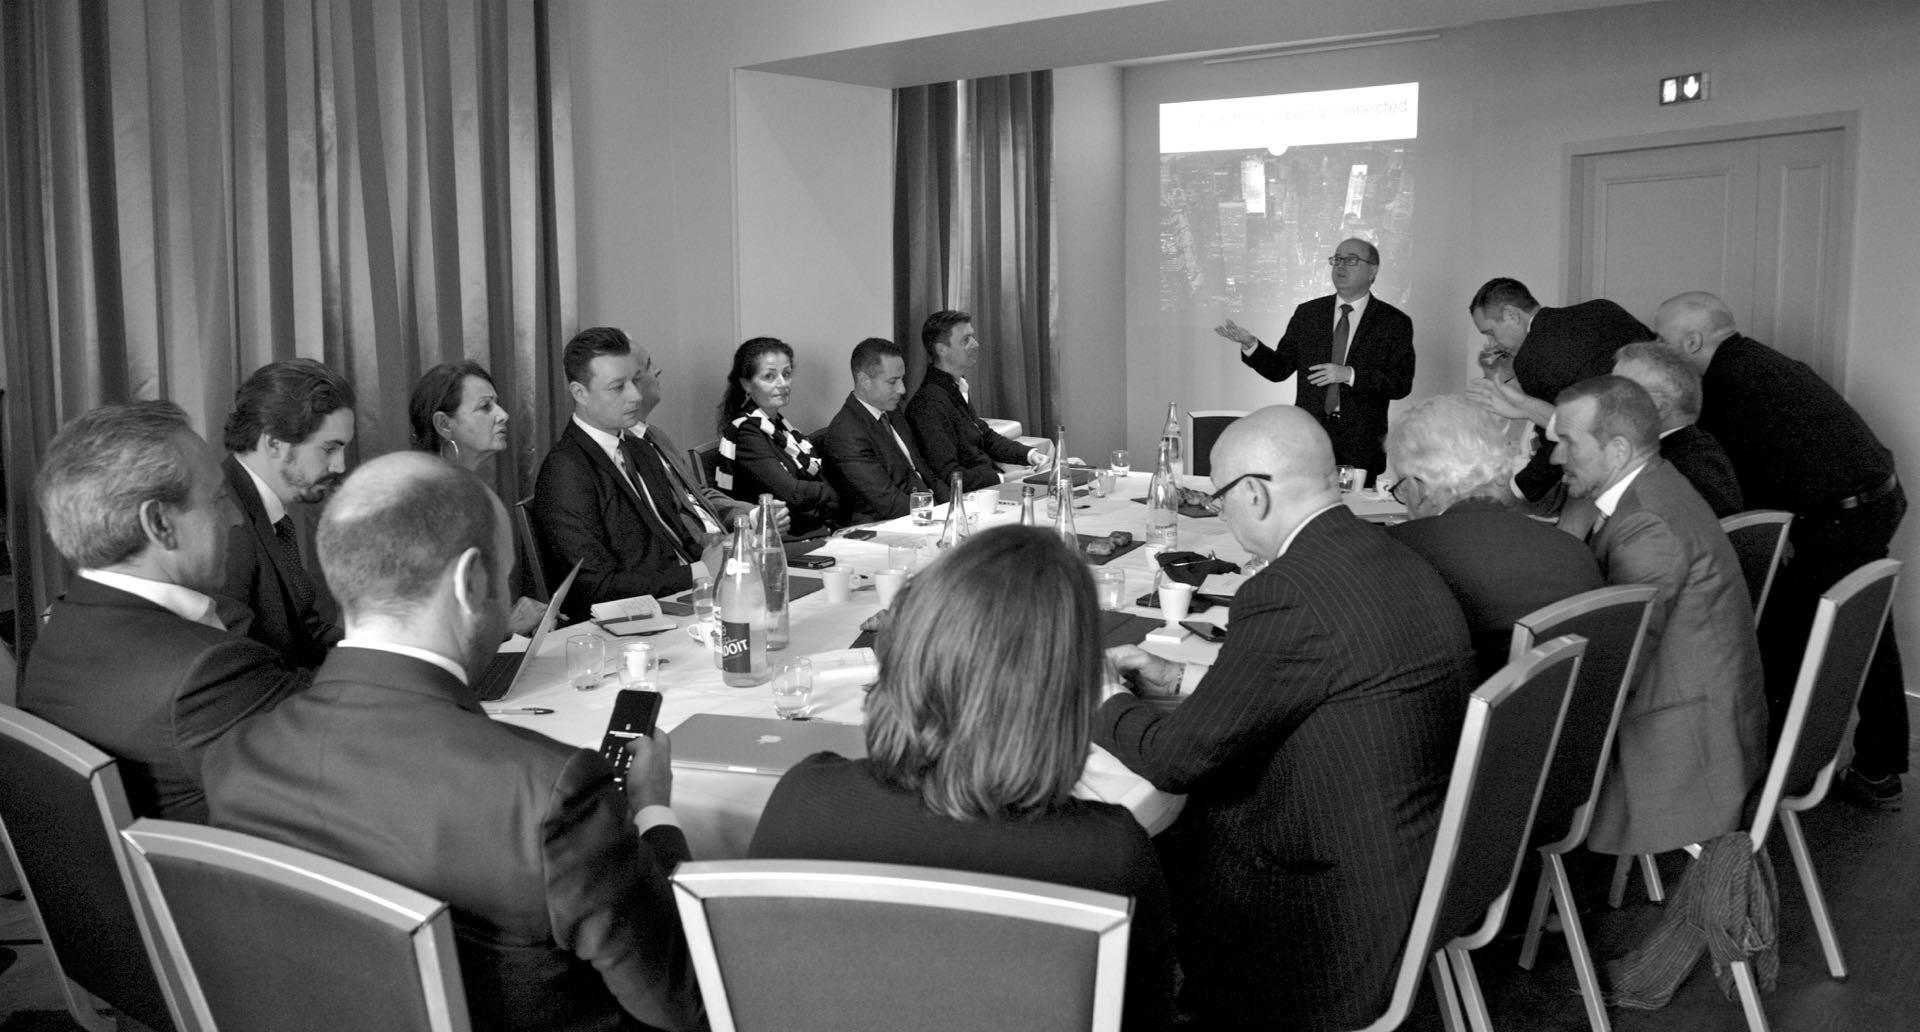 EREN Meeting 11-2017 in Bordeaux, France  - 1.jpg